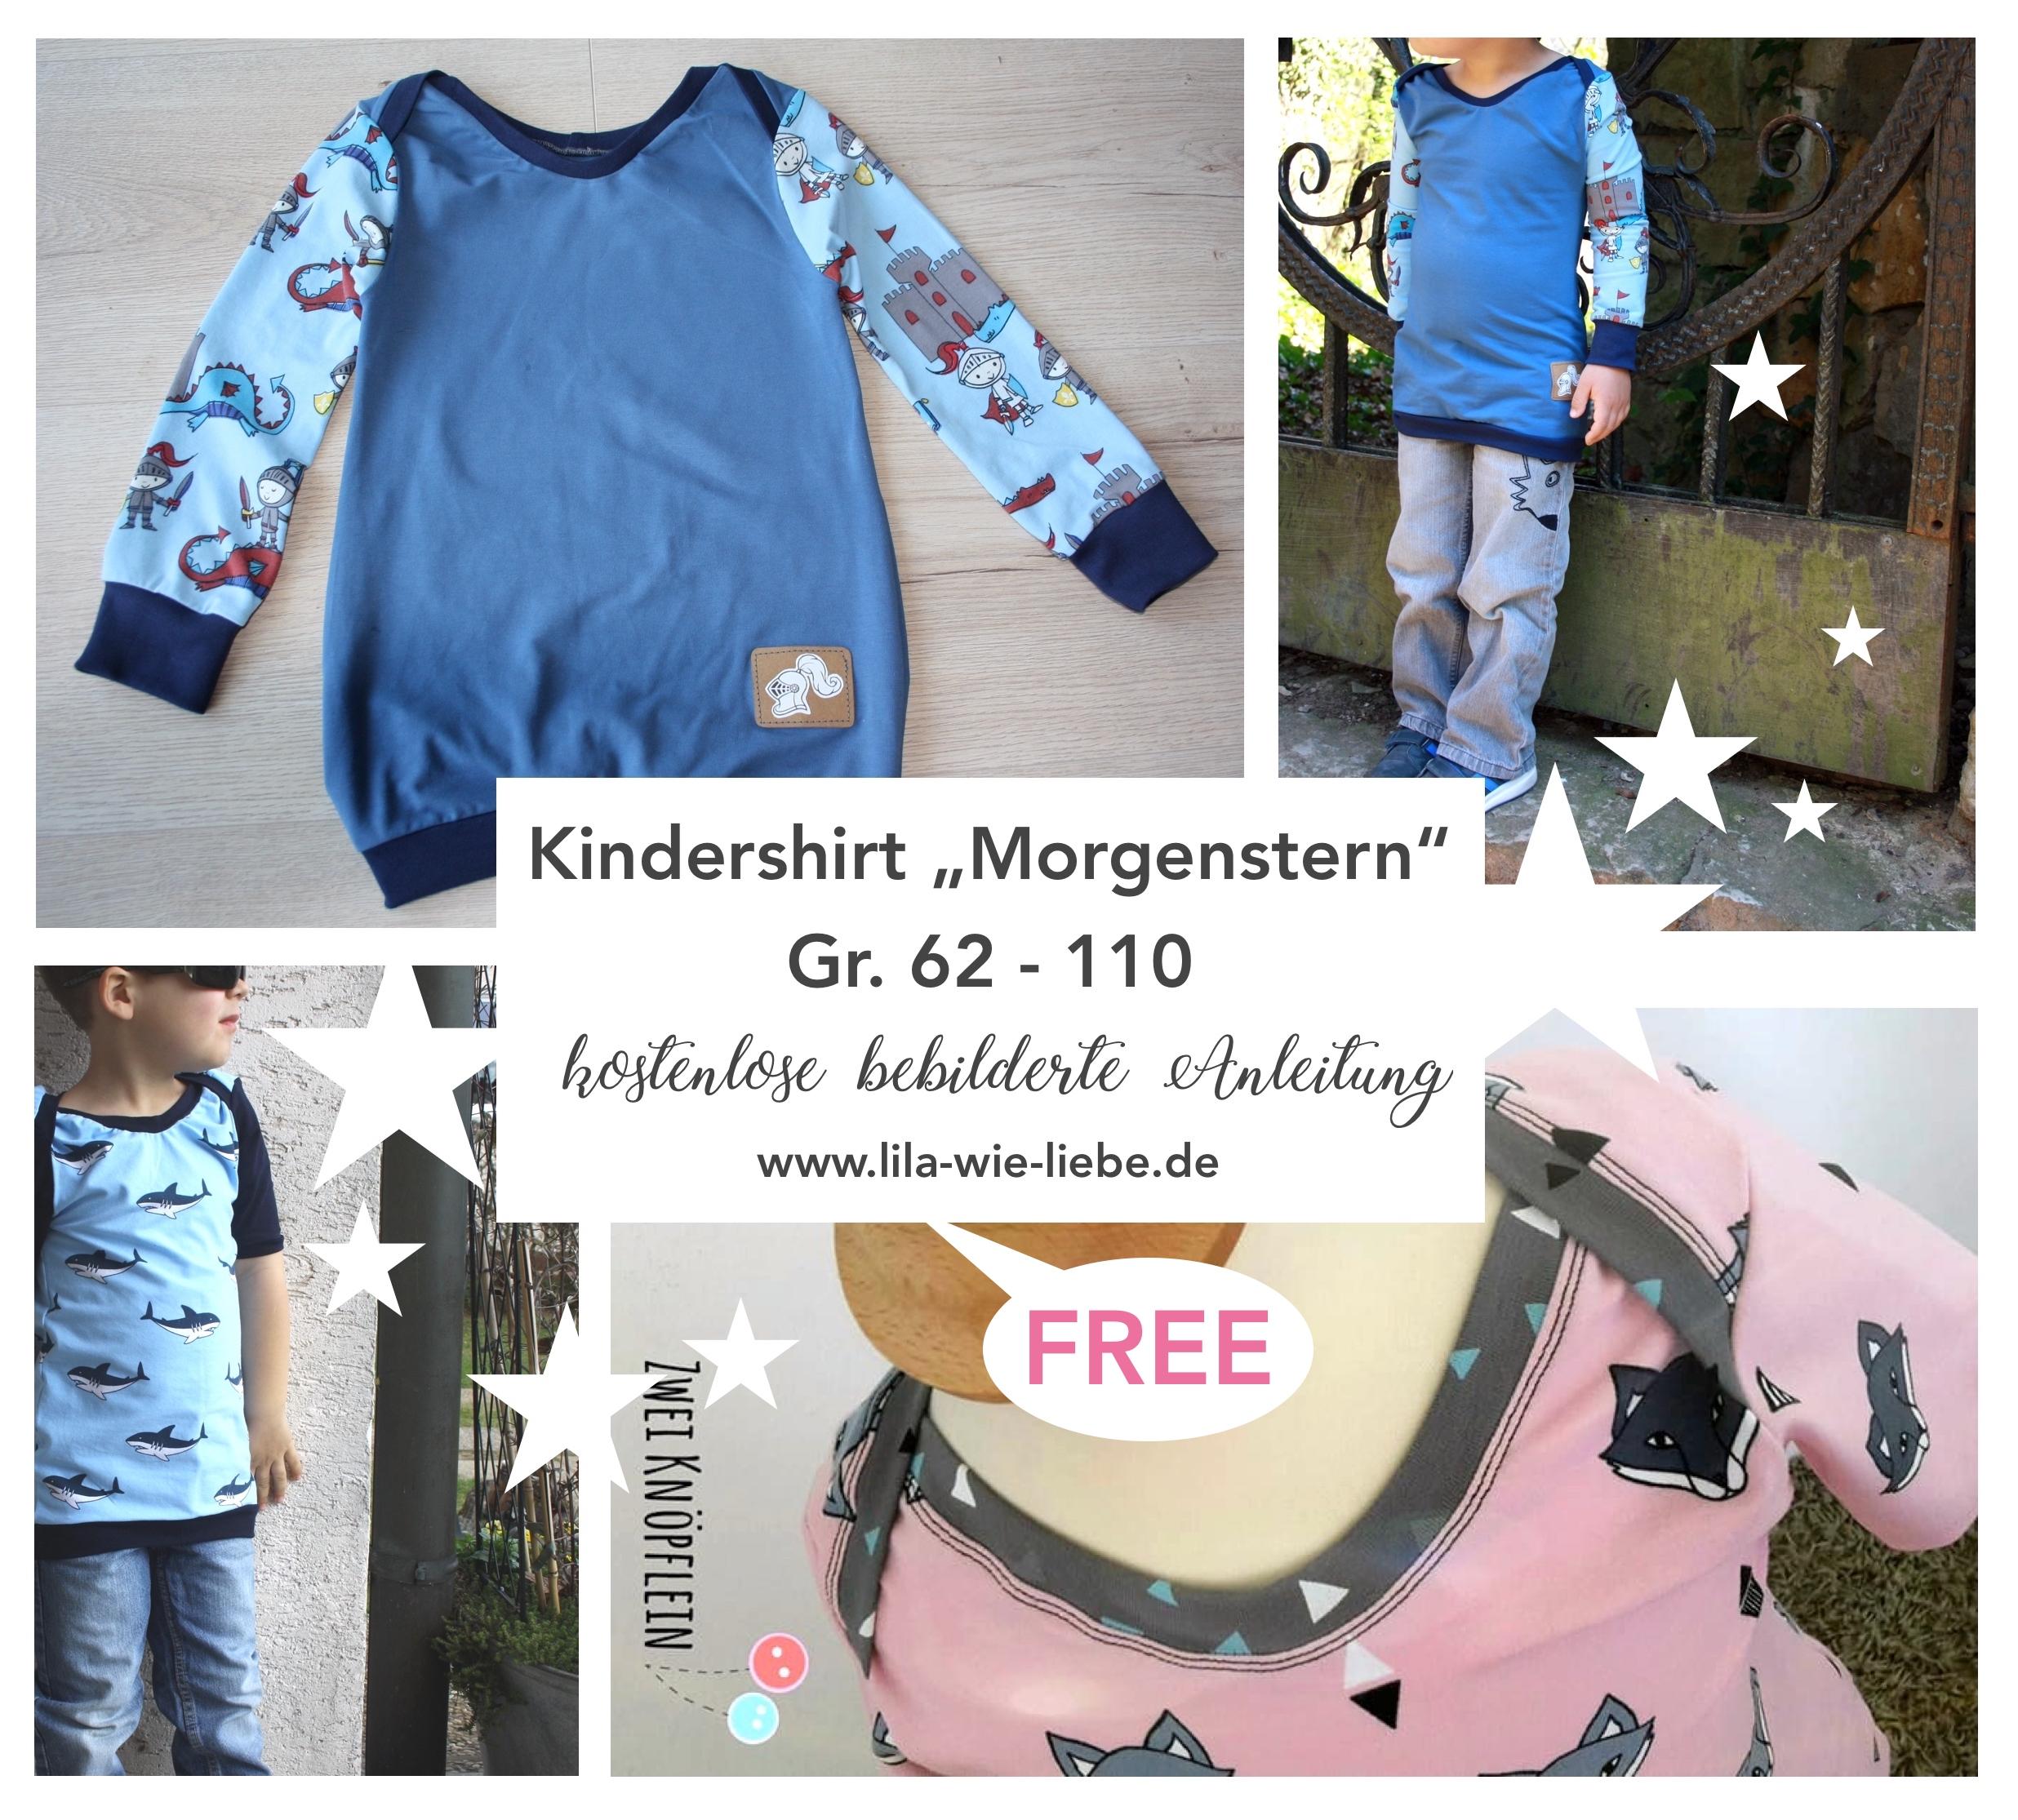 Wie Liebe Oxzutkip Kindershirt Lila Freebook Nähenmorgenstern 8kX0wOPn